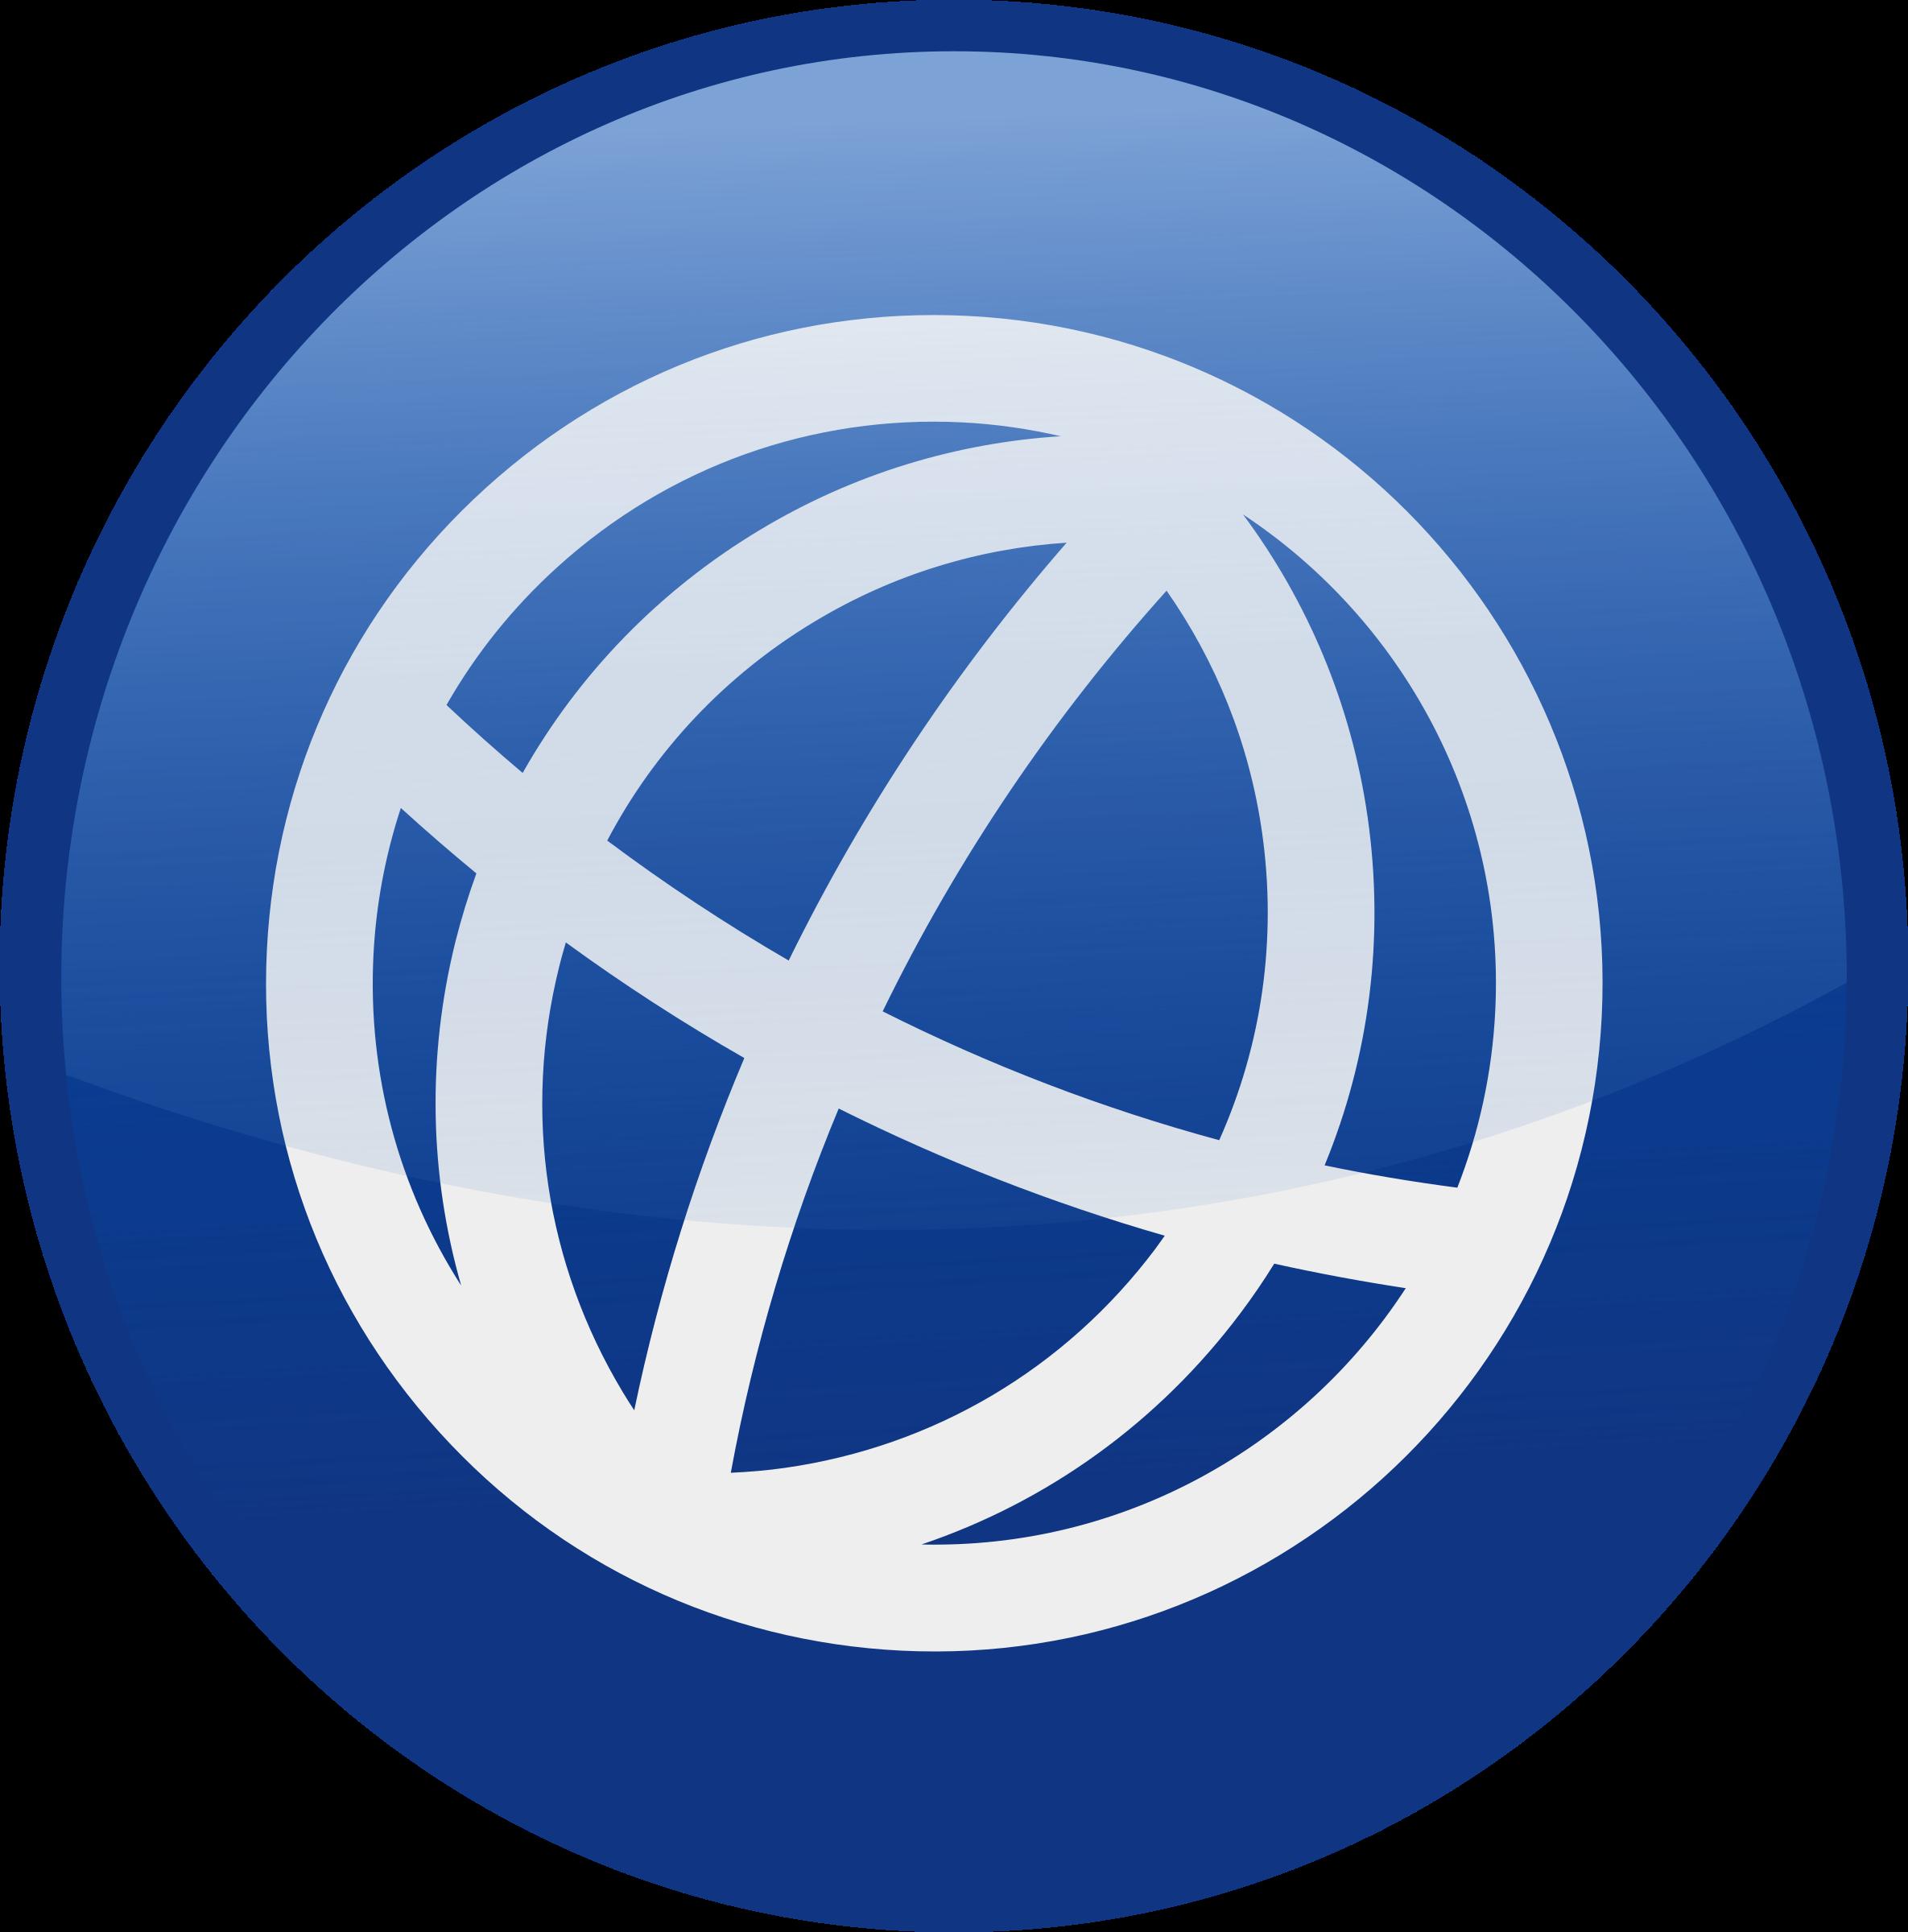 Website logo clipart clip transparent download Clipart - globe-blue clip transparent download